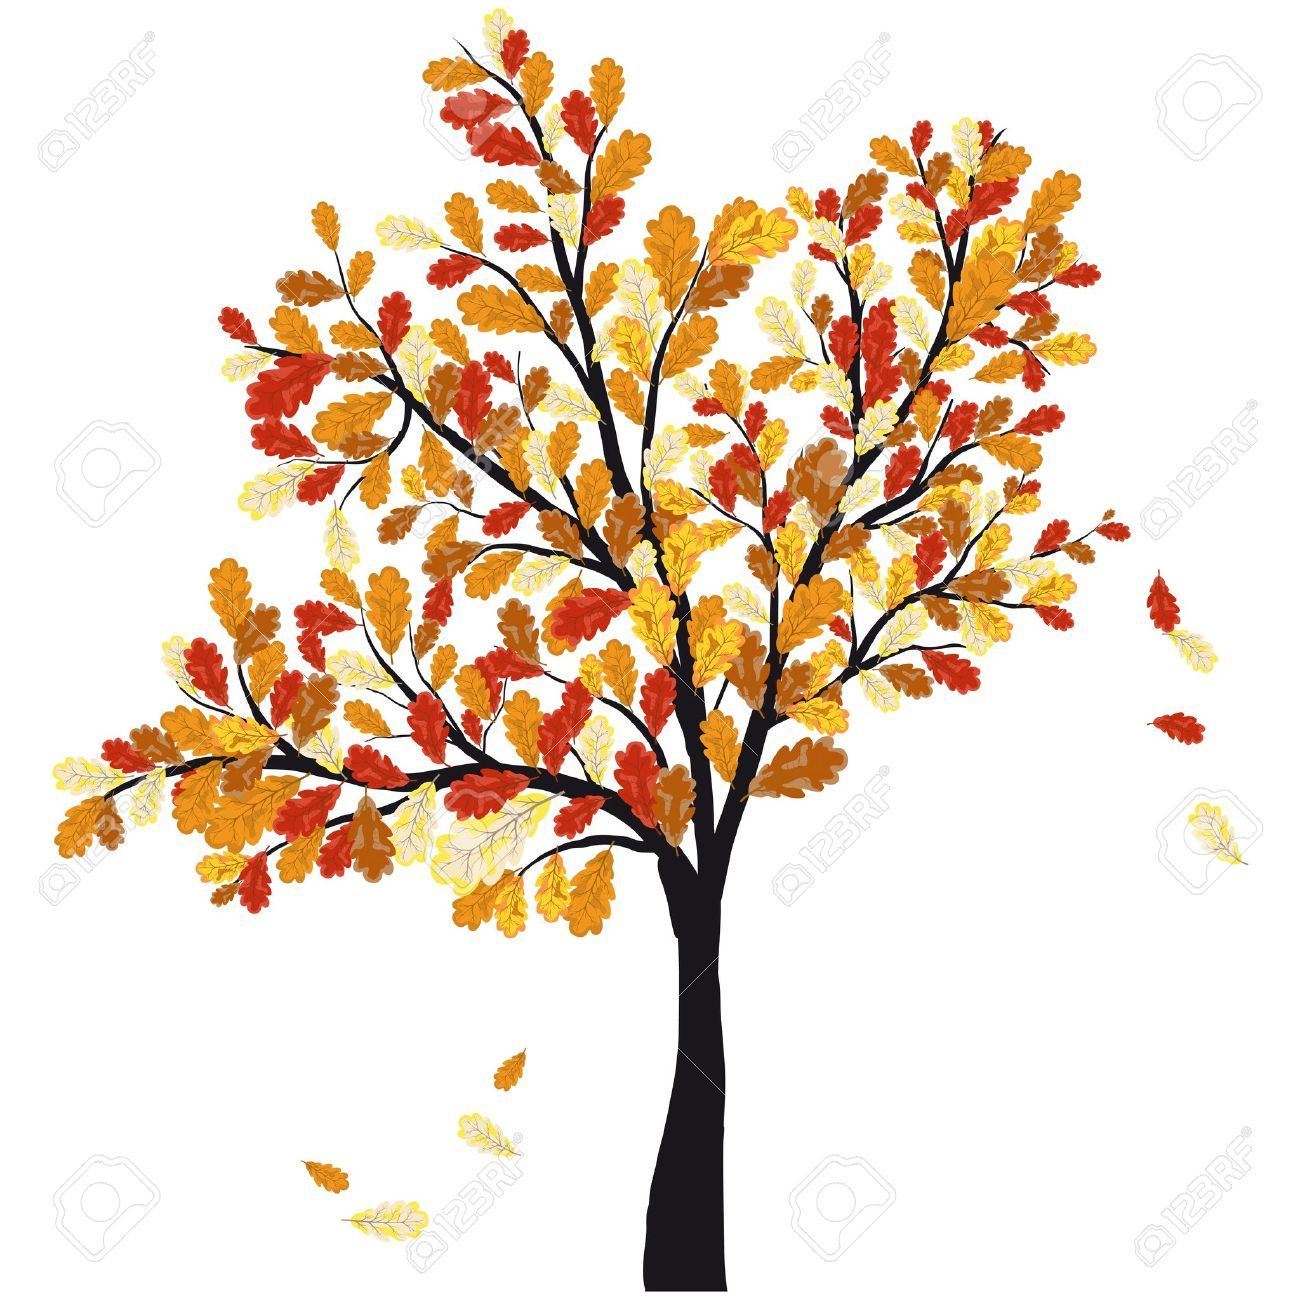 Autumn oak tree with falling Fall Tree Illustration